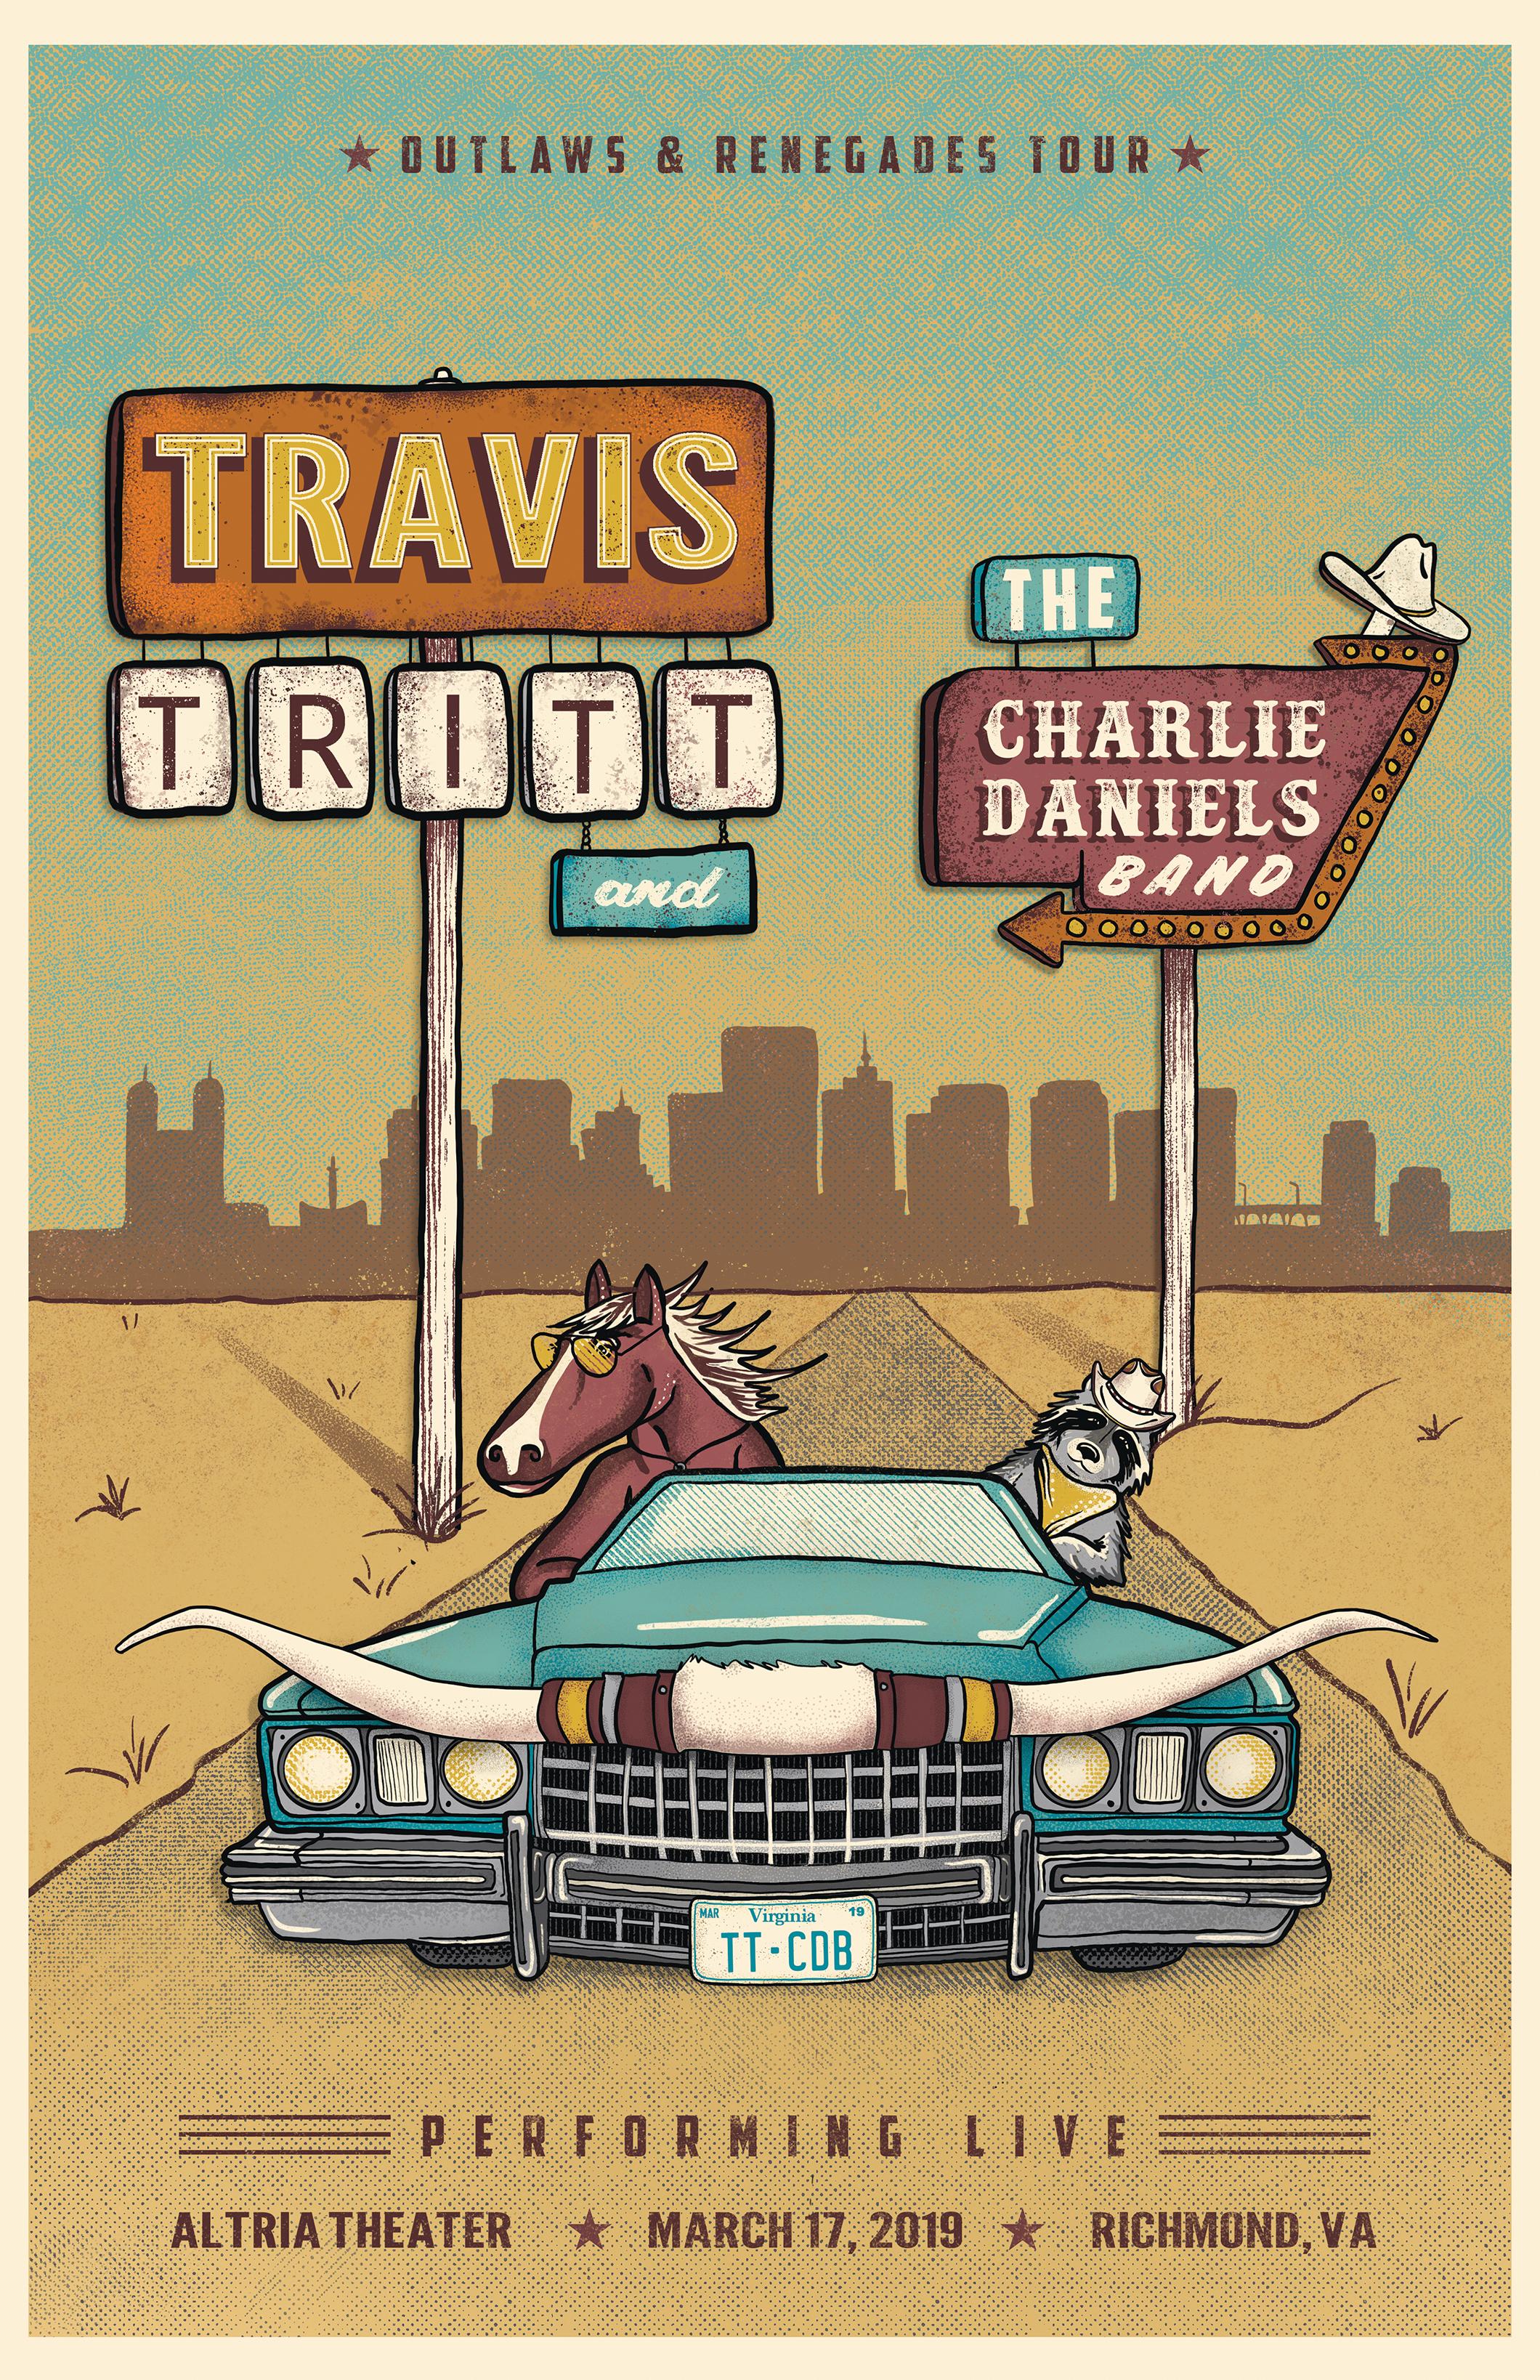 Travis Tritt and Charlie Daniels Band_Poster_2019_WEB.jpg